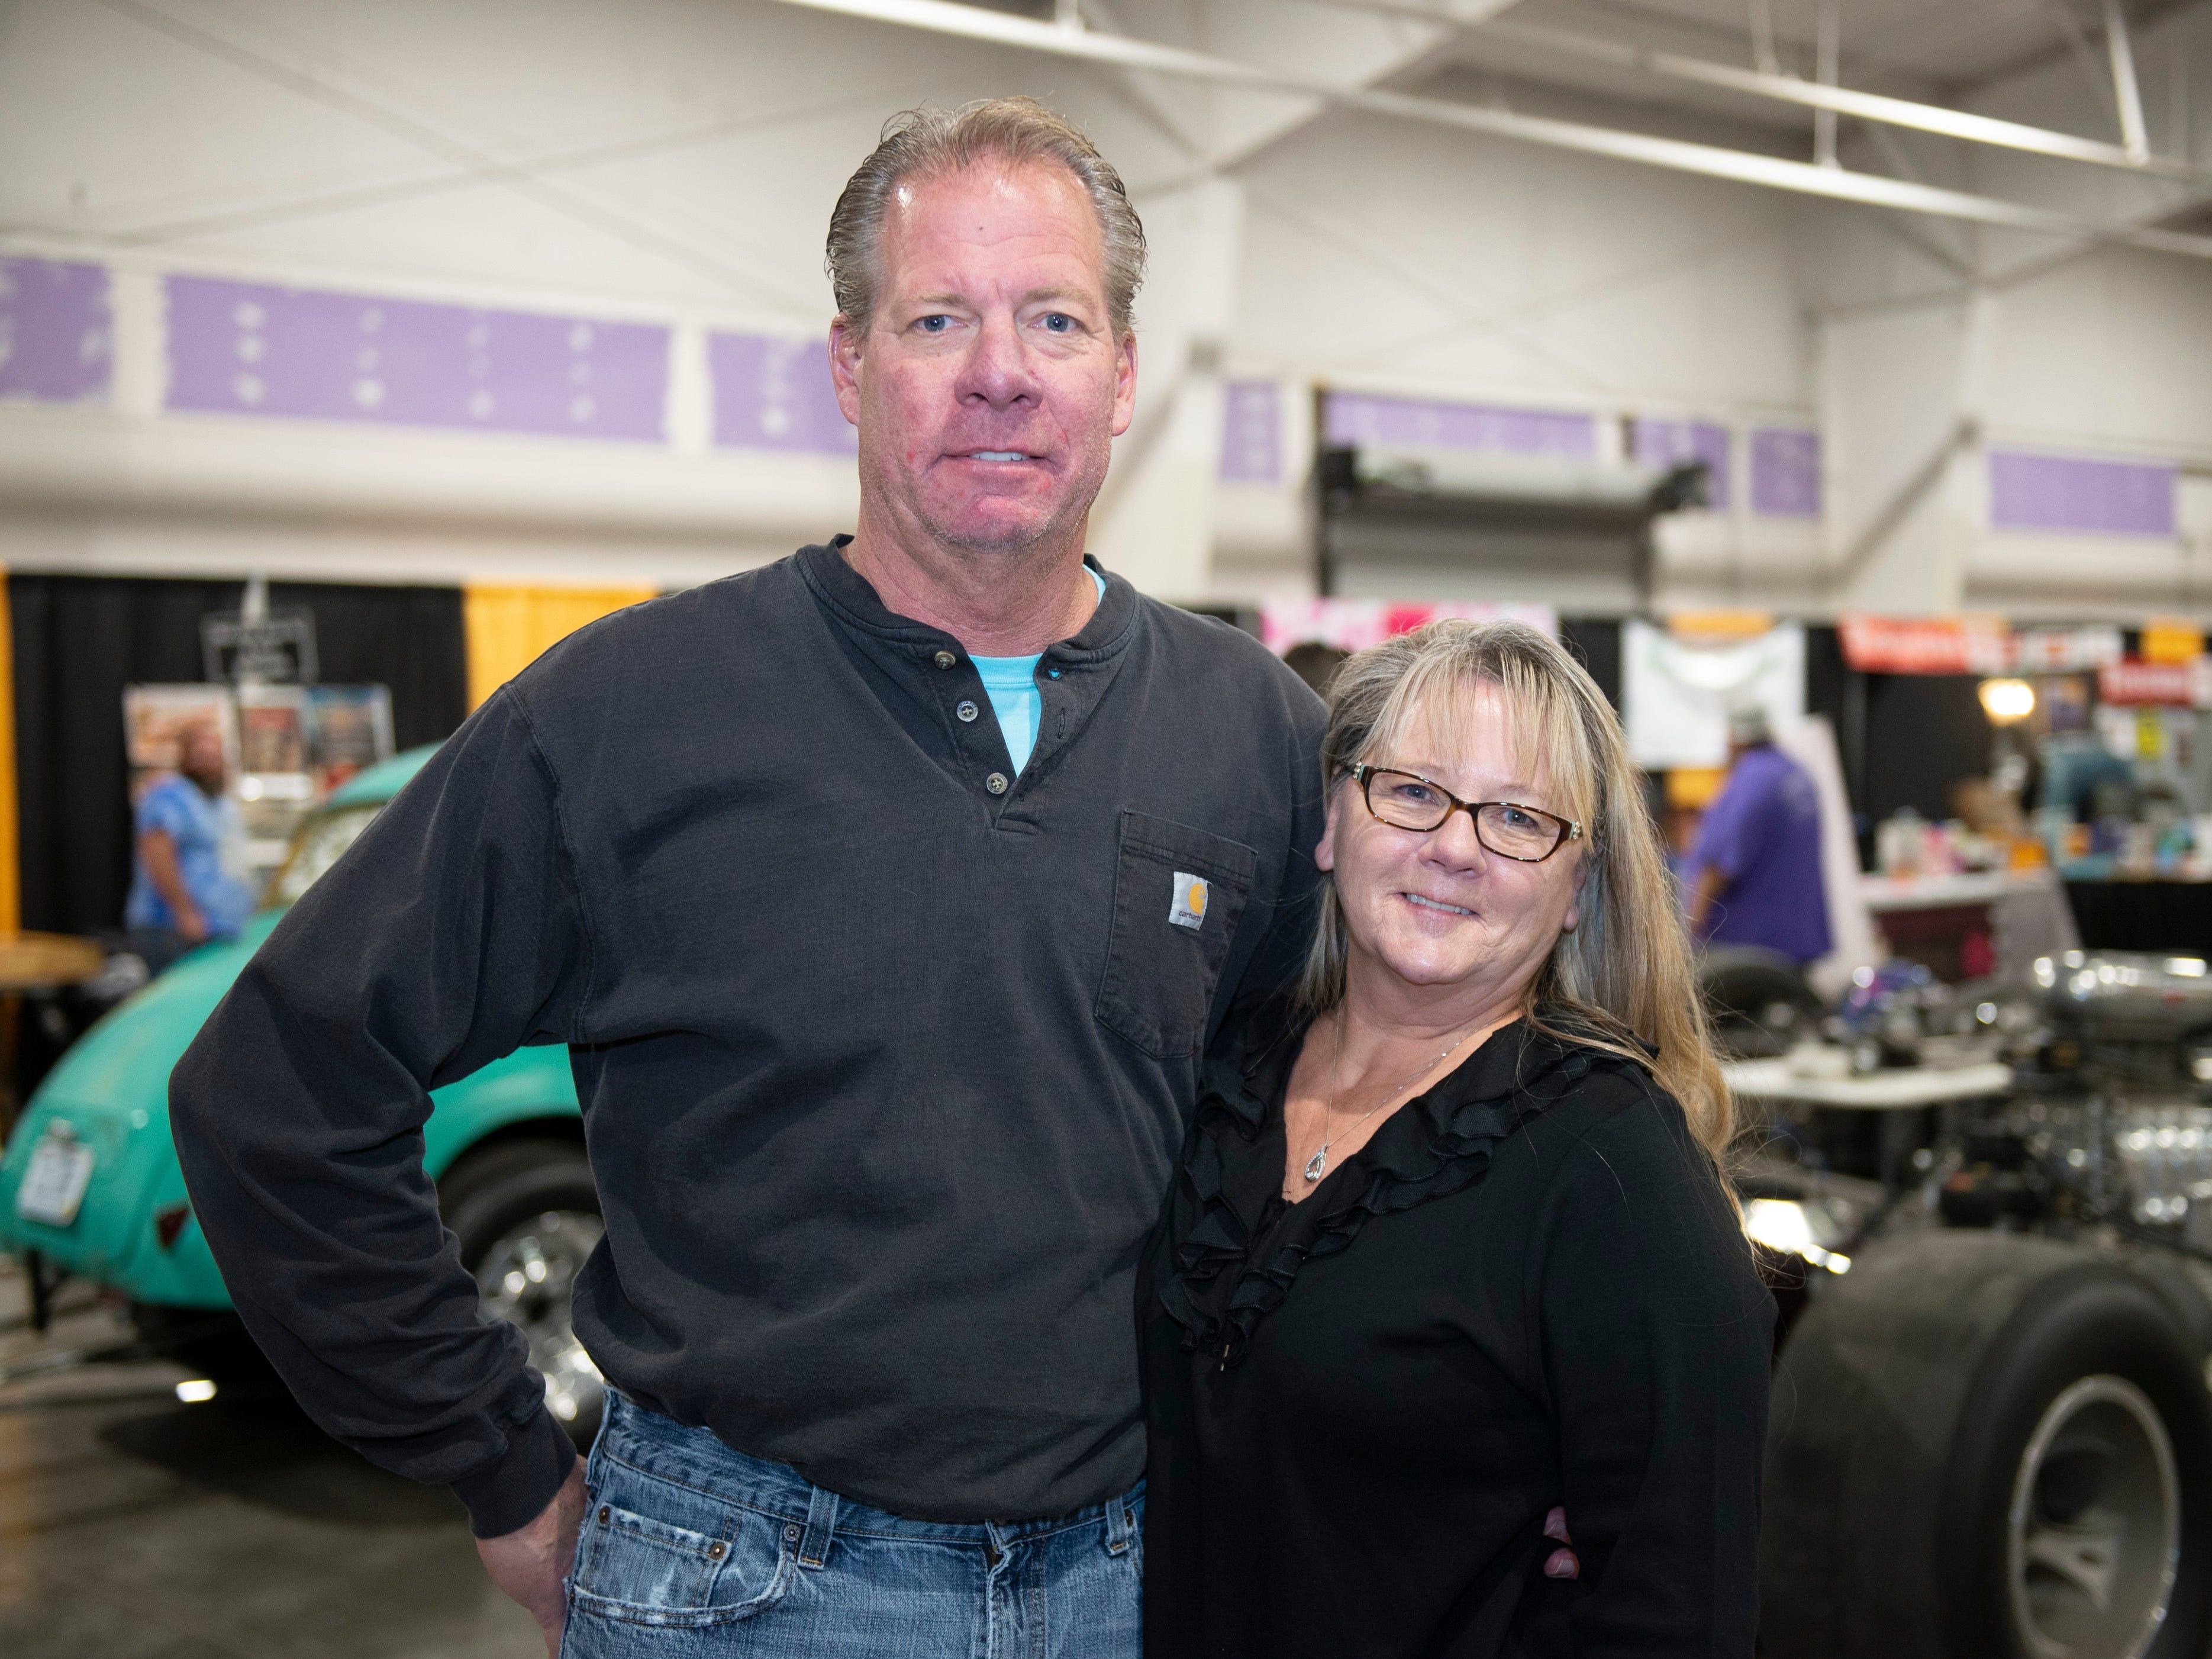 Patty and Scott Rettig